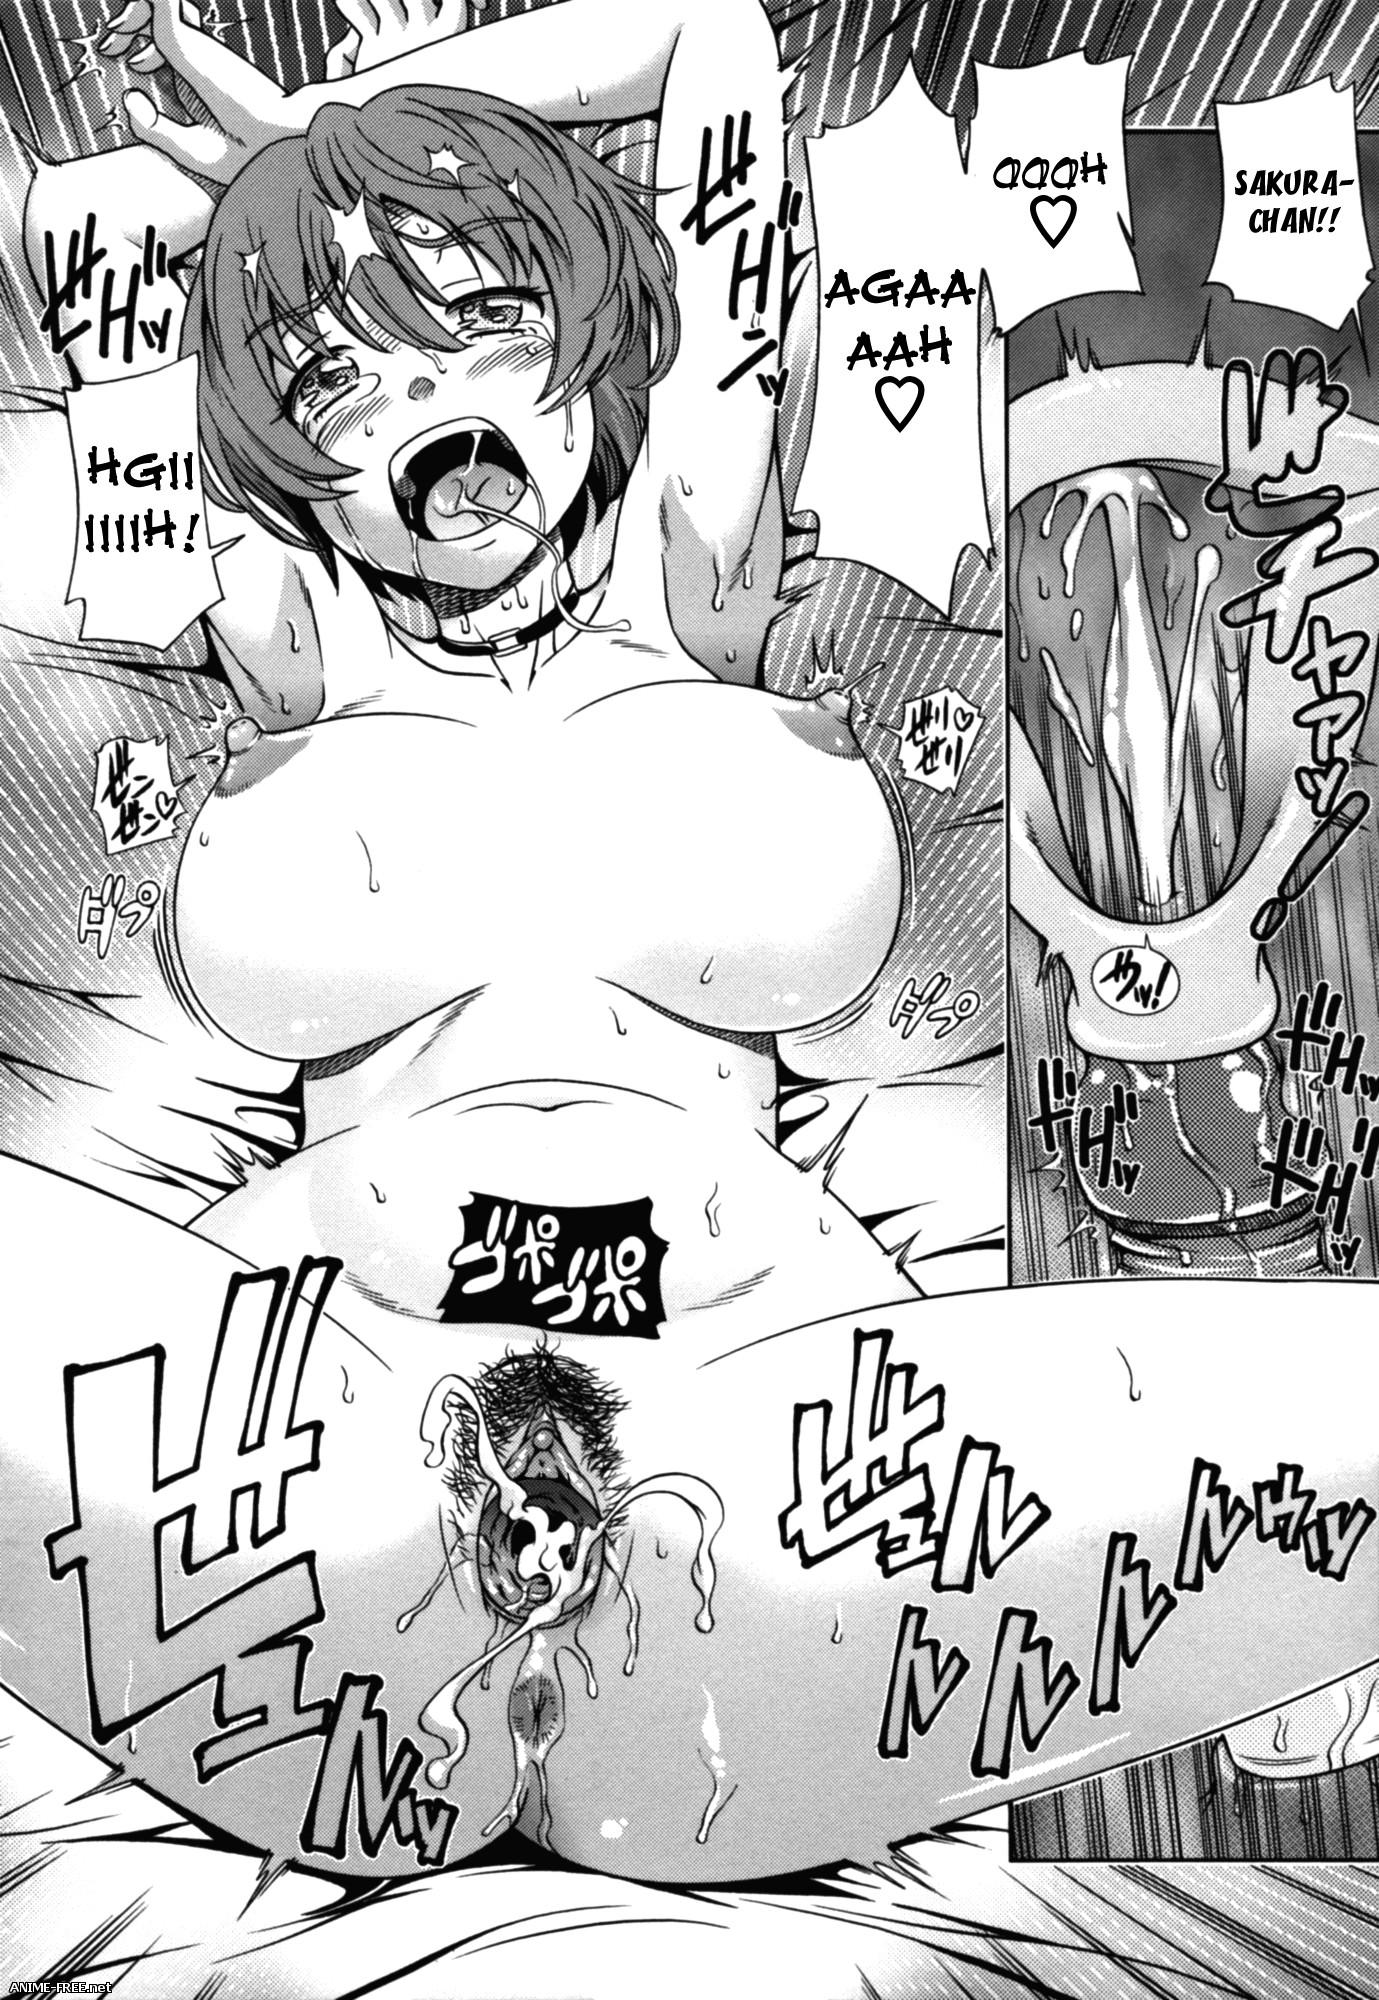 Fukudahda / ffkkdddd / Kensou Ogawa (Collection) | Сборник хентай манги [Ptcen] [JAP,RUS,ENG] Manga Hentai